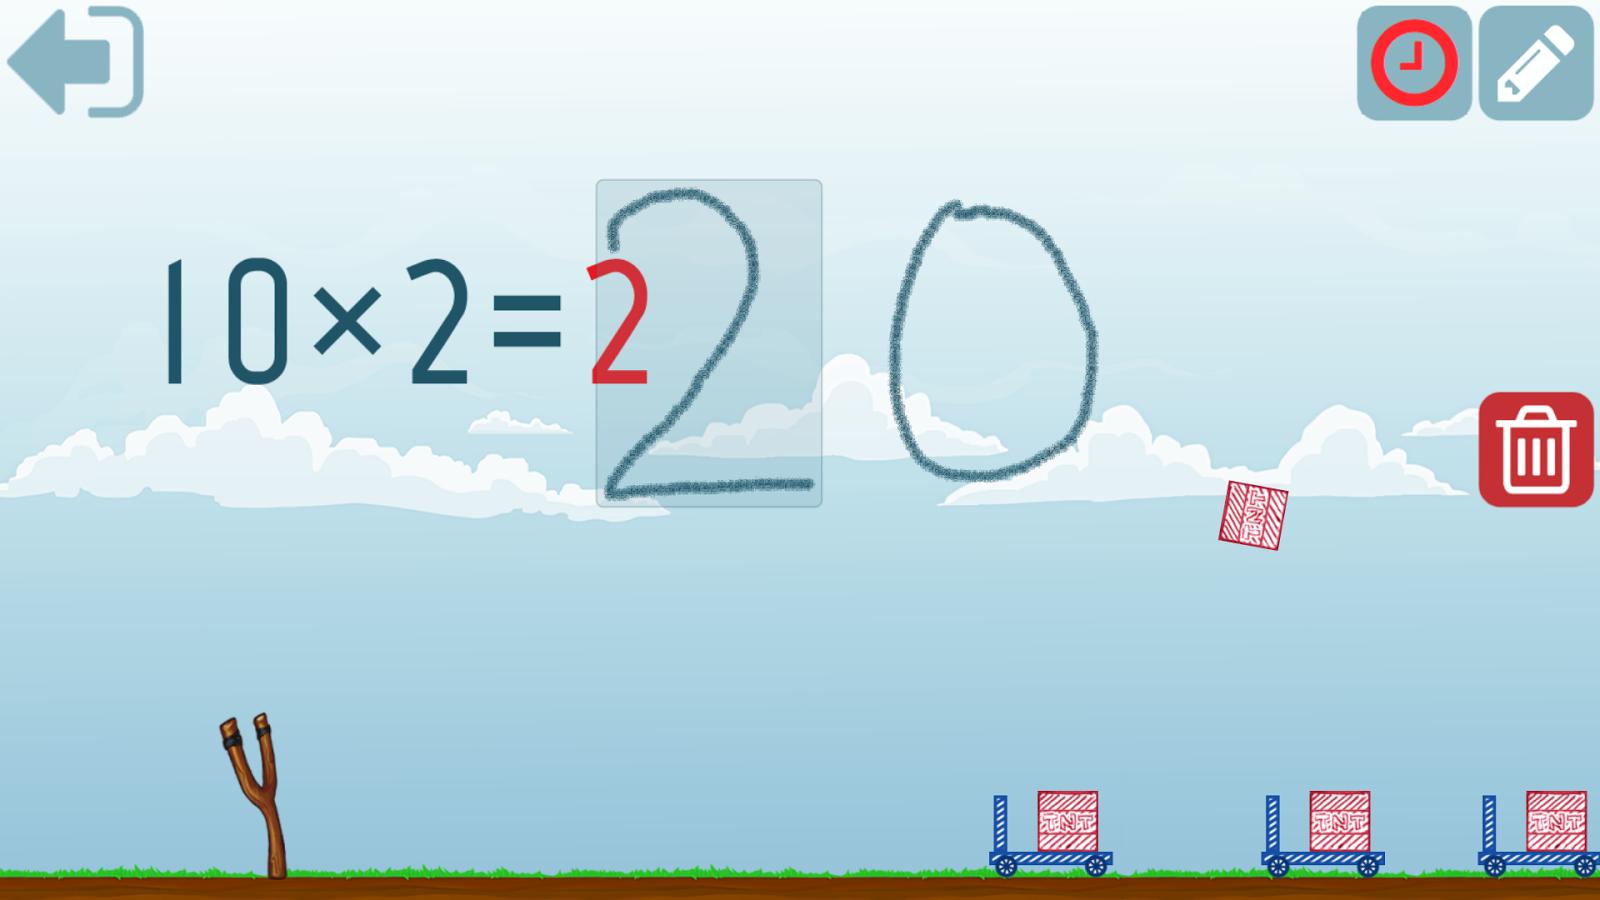 Dritte Klasse Mathematik - Multiplikation android apps download